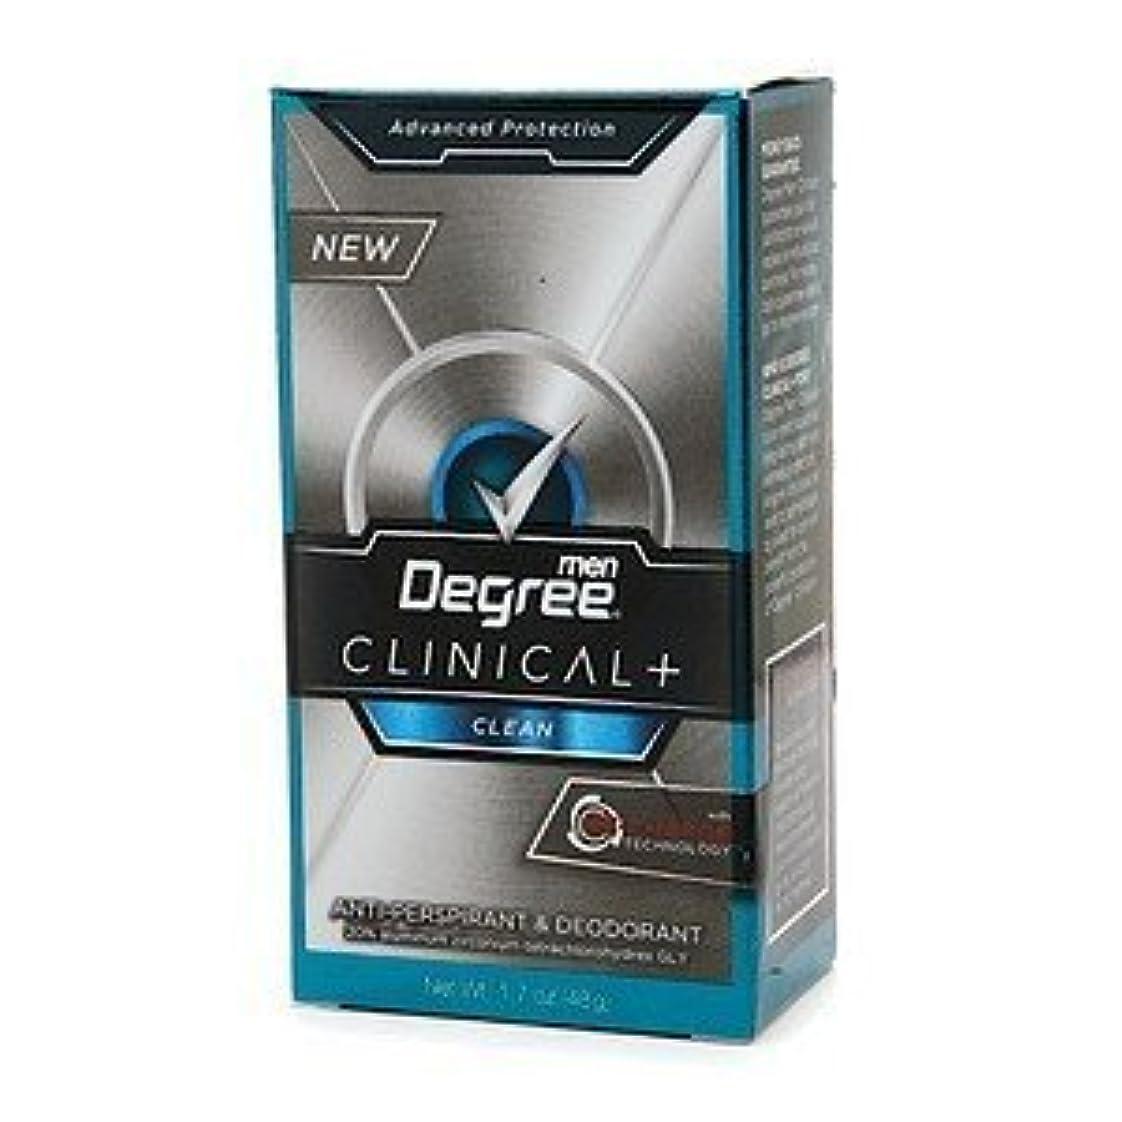 批評放射性同盟Degree Men Clinical+ Antiperspirant & Deodorant, Clean, 50g (Pack of 6) (並行輸入品)